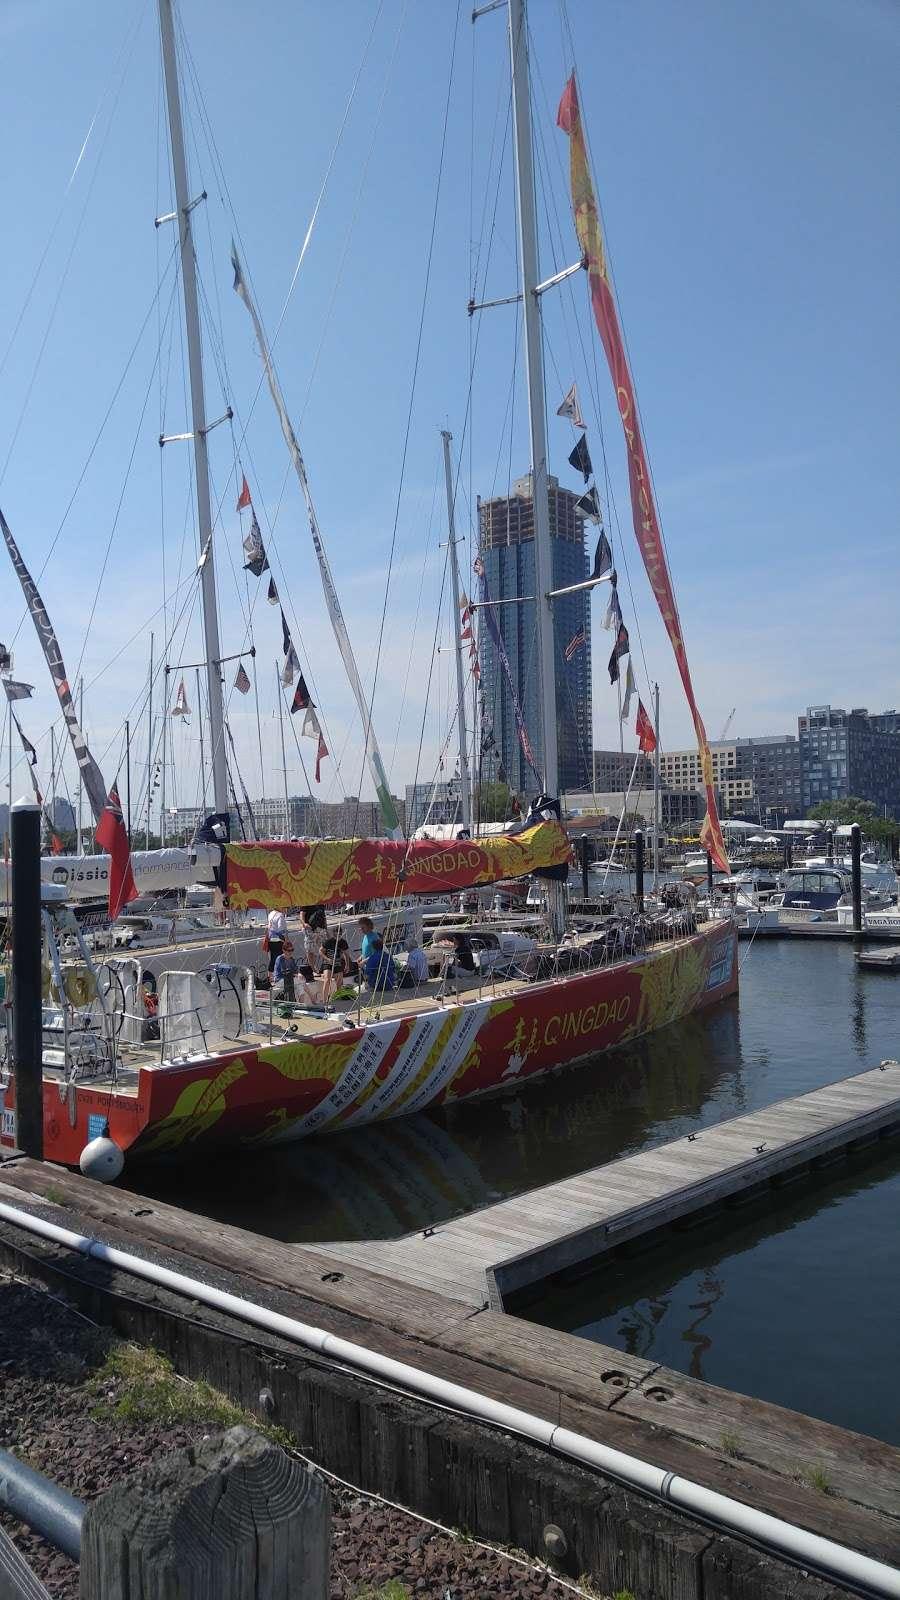 Liberty Landing Marina Fuel Dock - gas station  | Photo 1 of 1 | Address: 80 Audrey Zapp Dr, Jersey City, NJ 07305, USA | Phone: (201) 985-8000